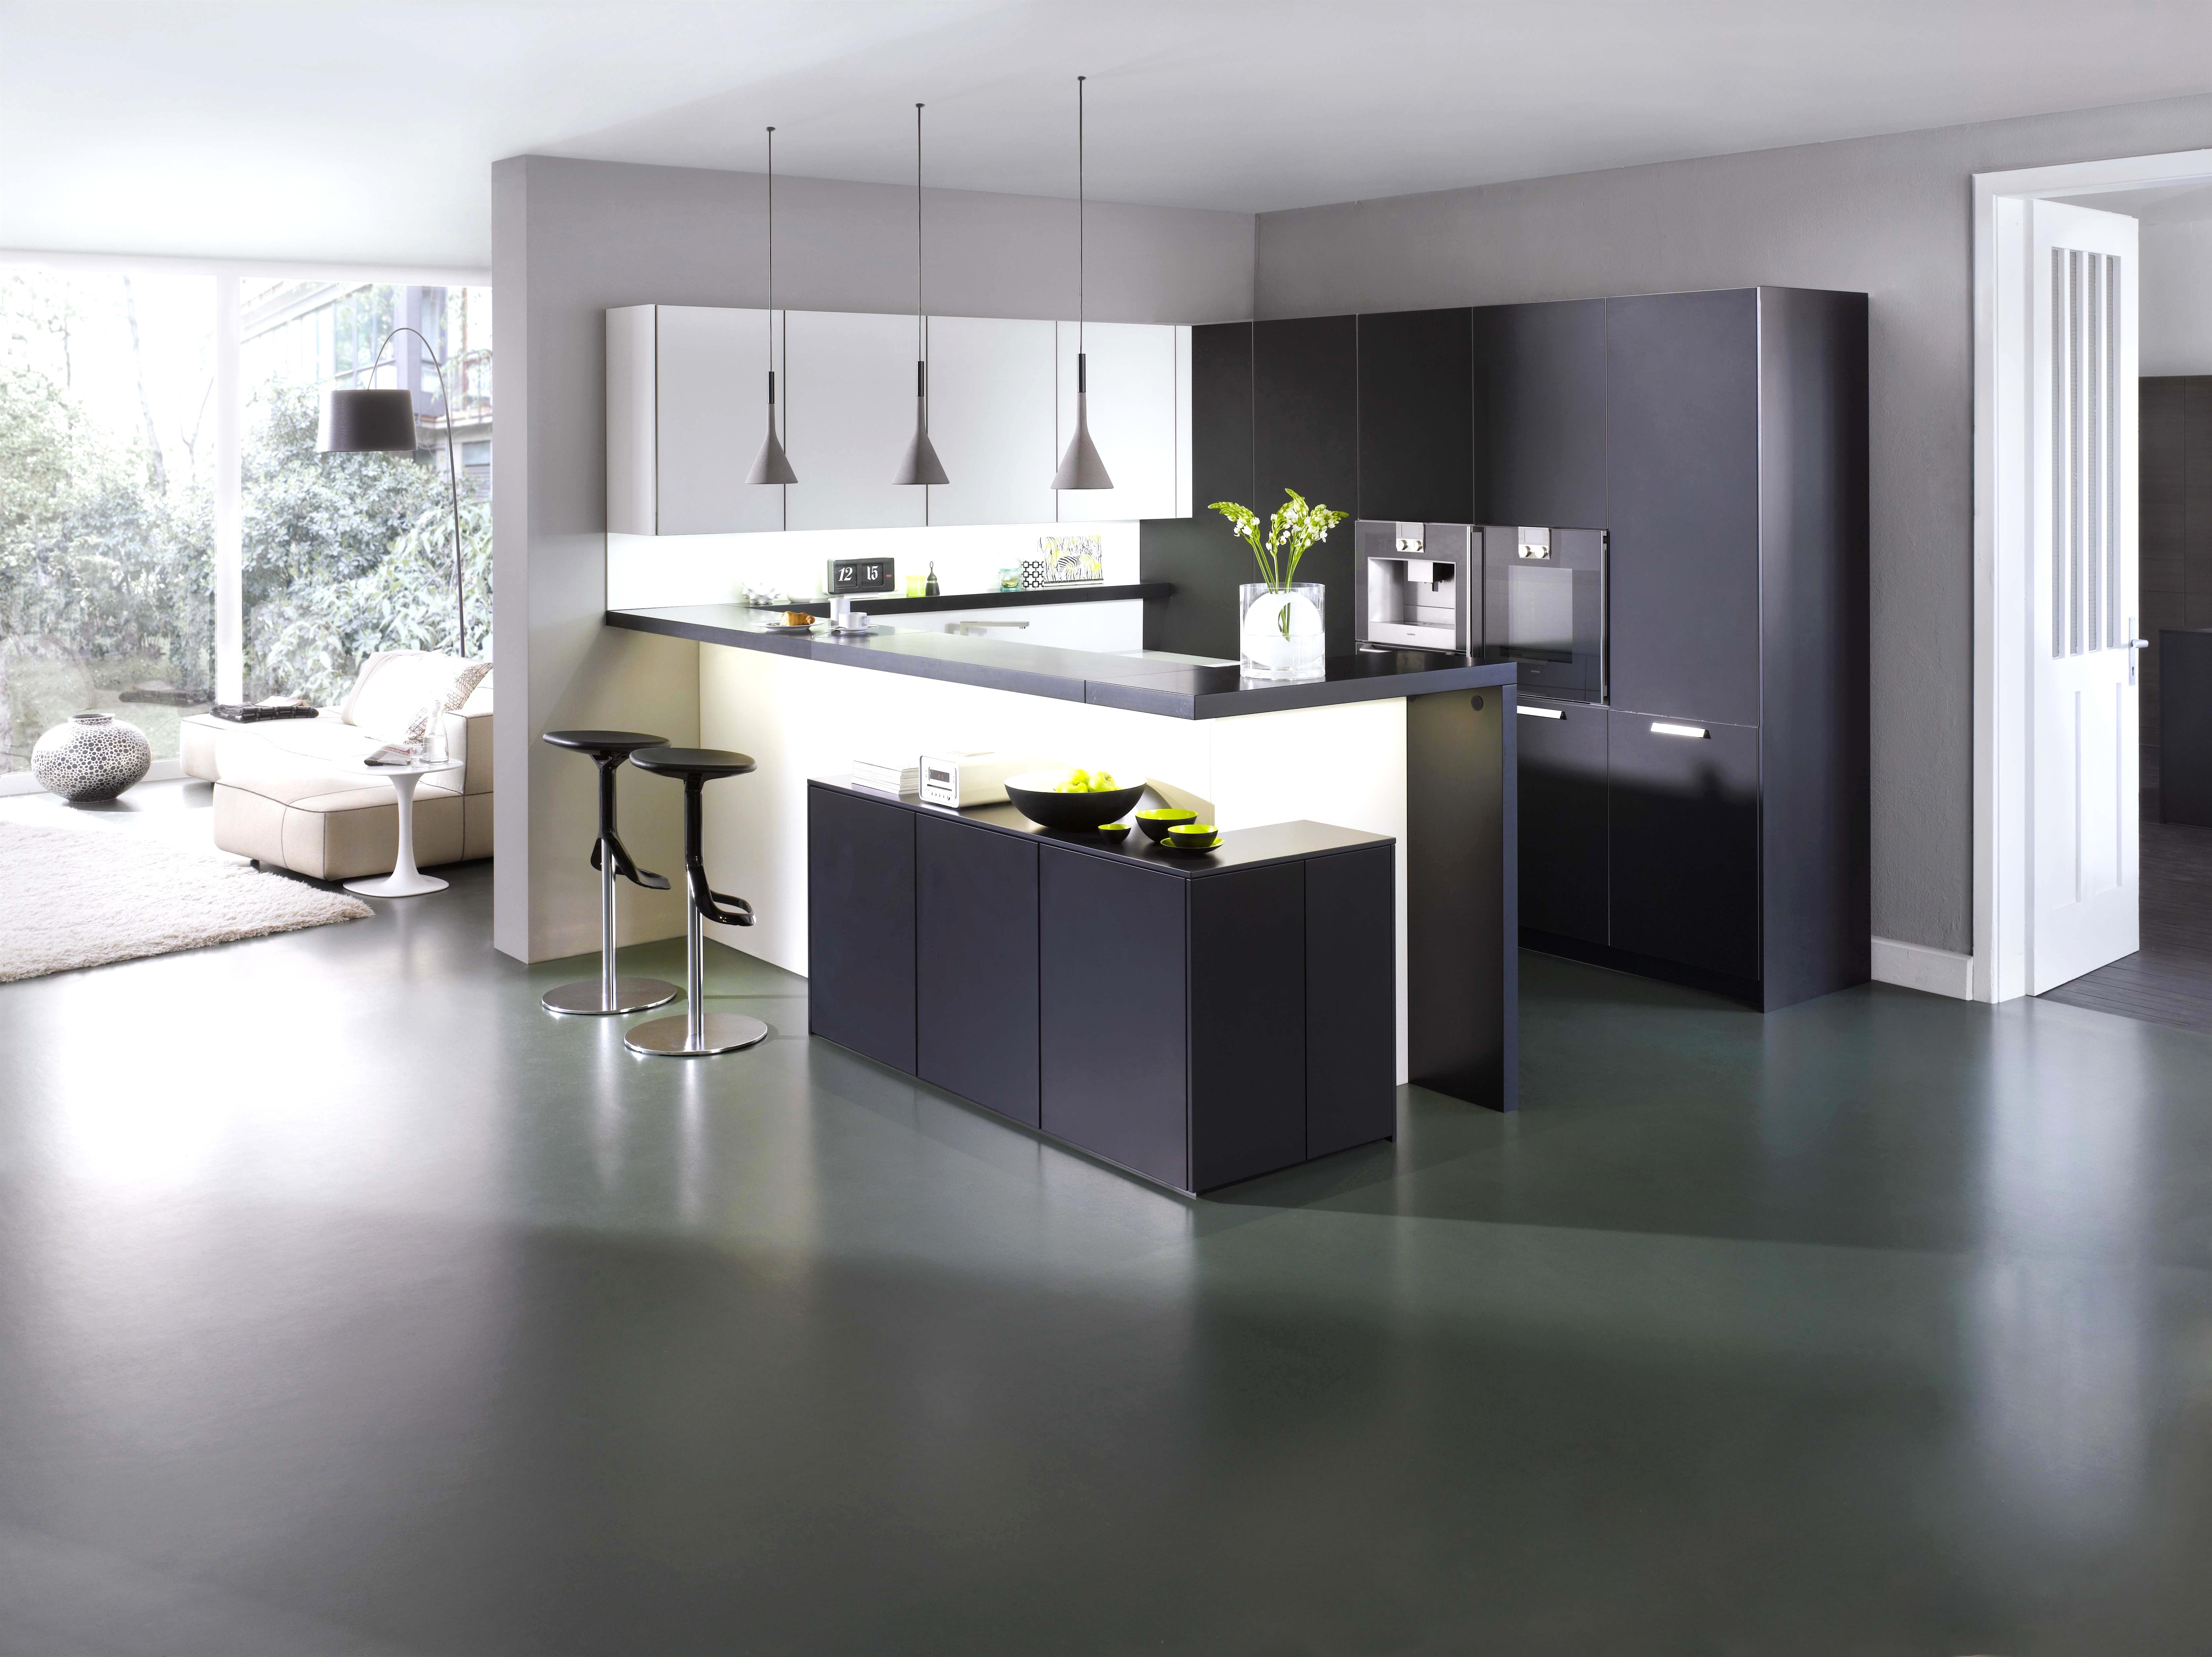 Cuisine Intégrée Leroy Merlin Inspirant Galerie Meuble Cuisine Gris Avec Ikea sol Stratifi Avec Cuisine sol Gris